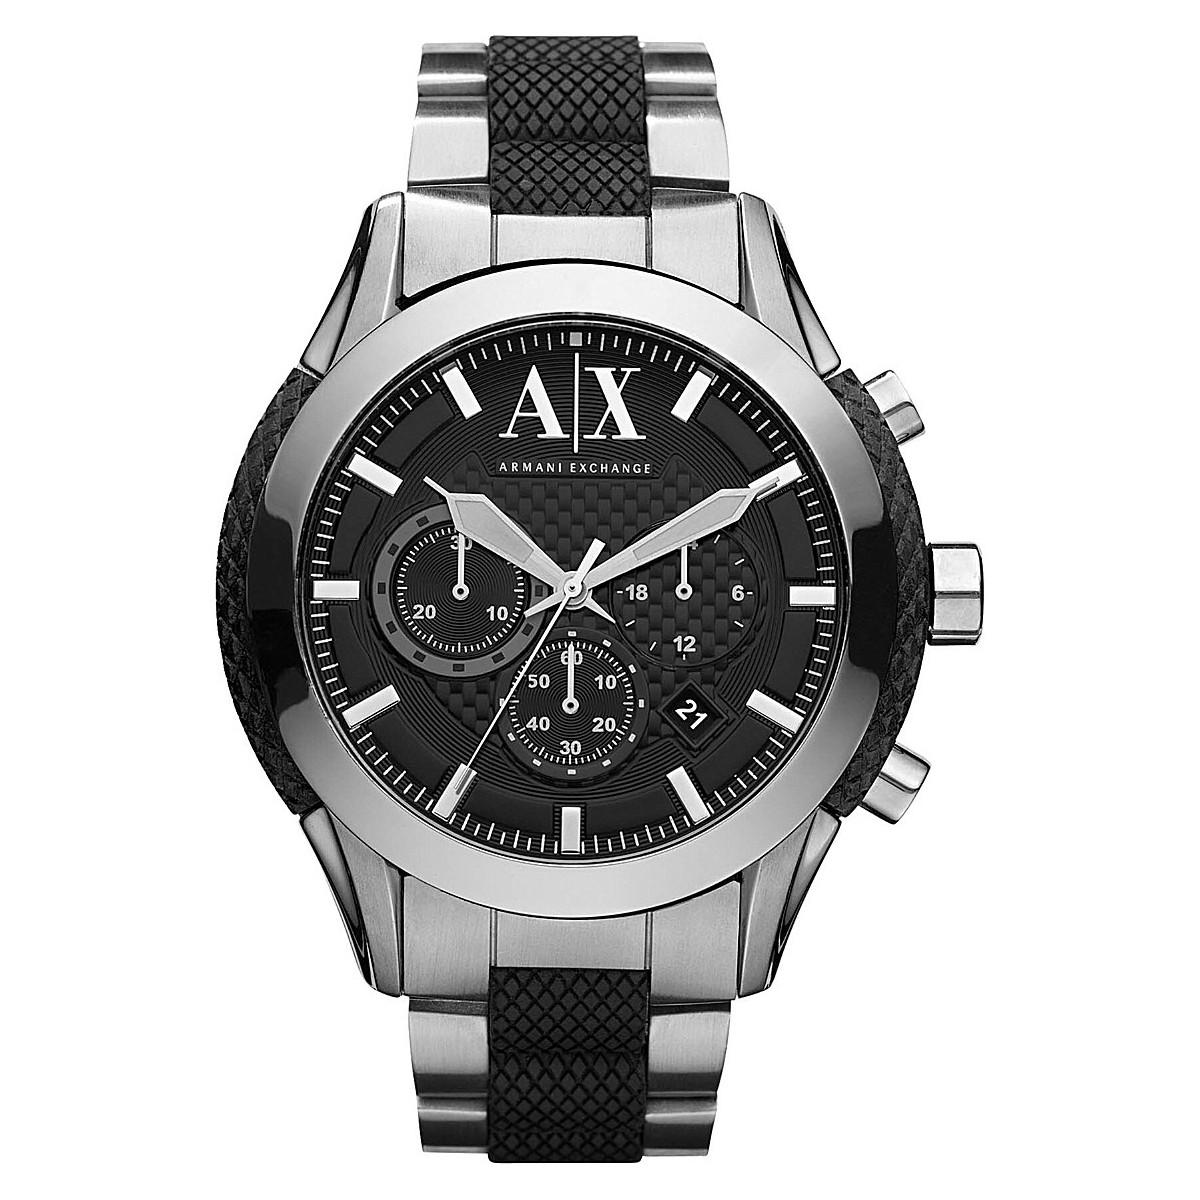 2d86ea440df5f Compre Relógio Armani Exchange em 10X